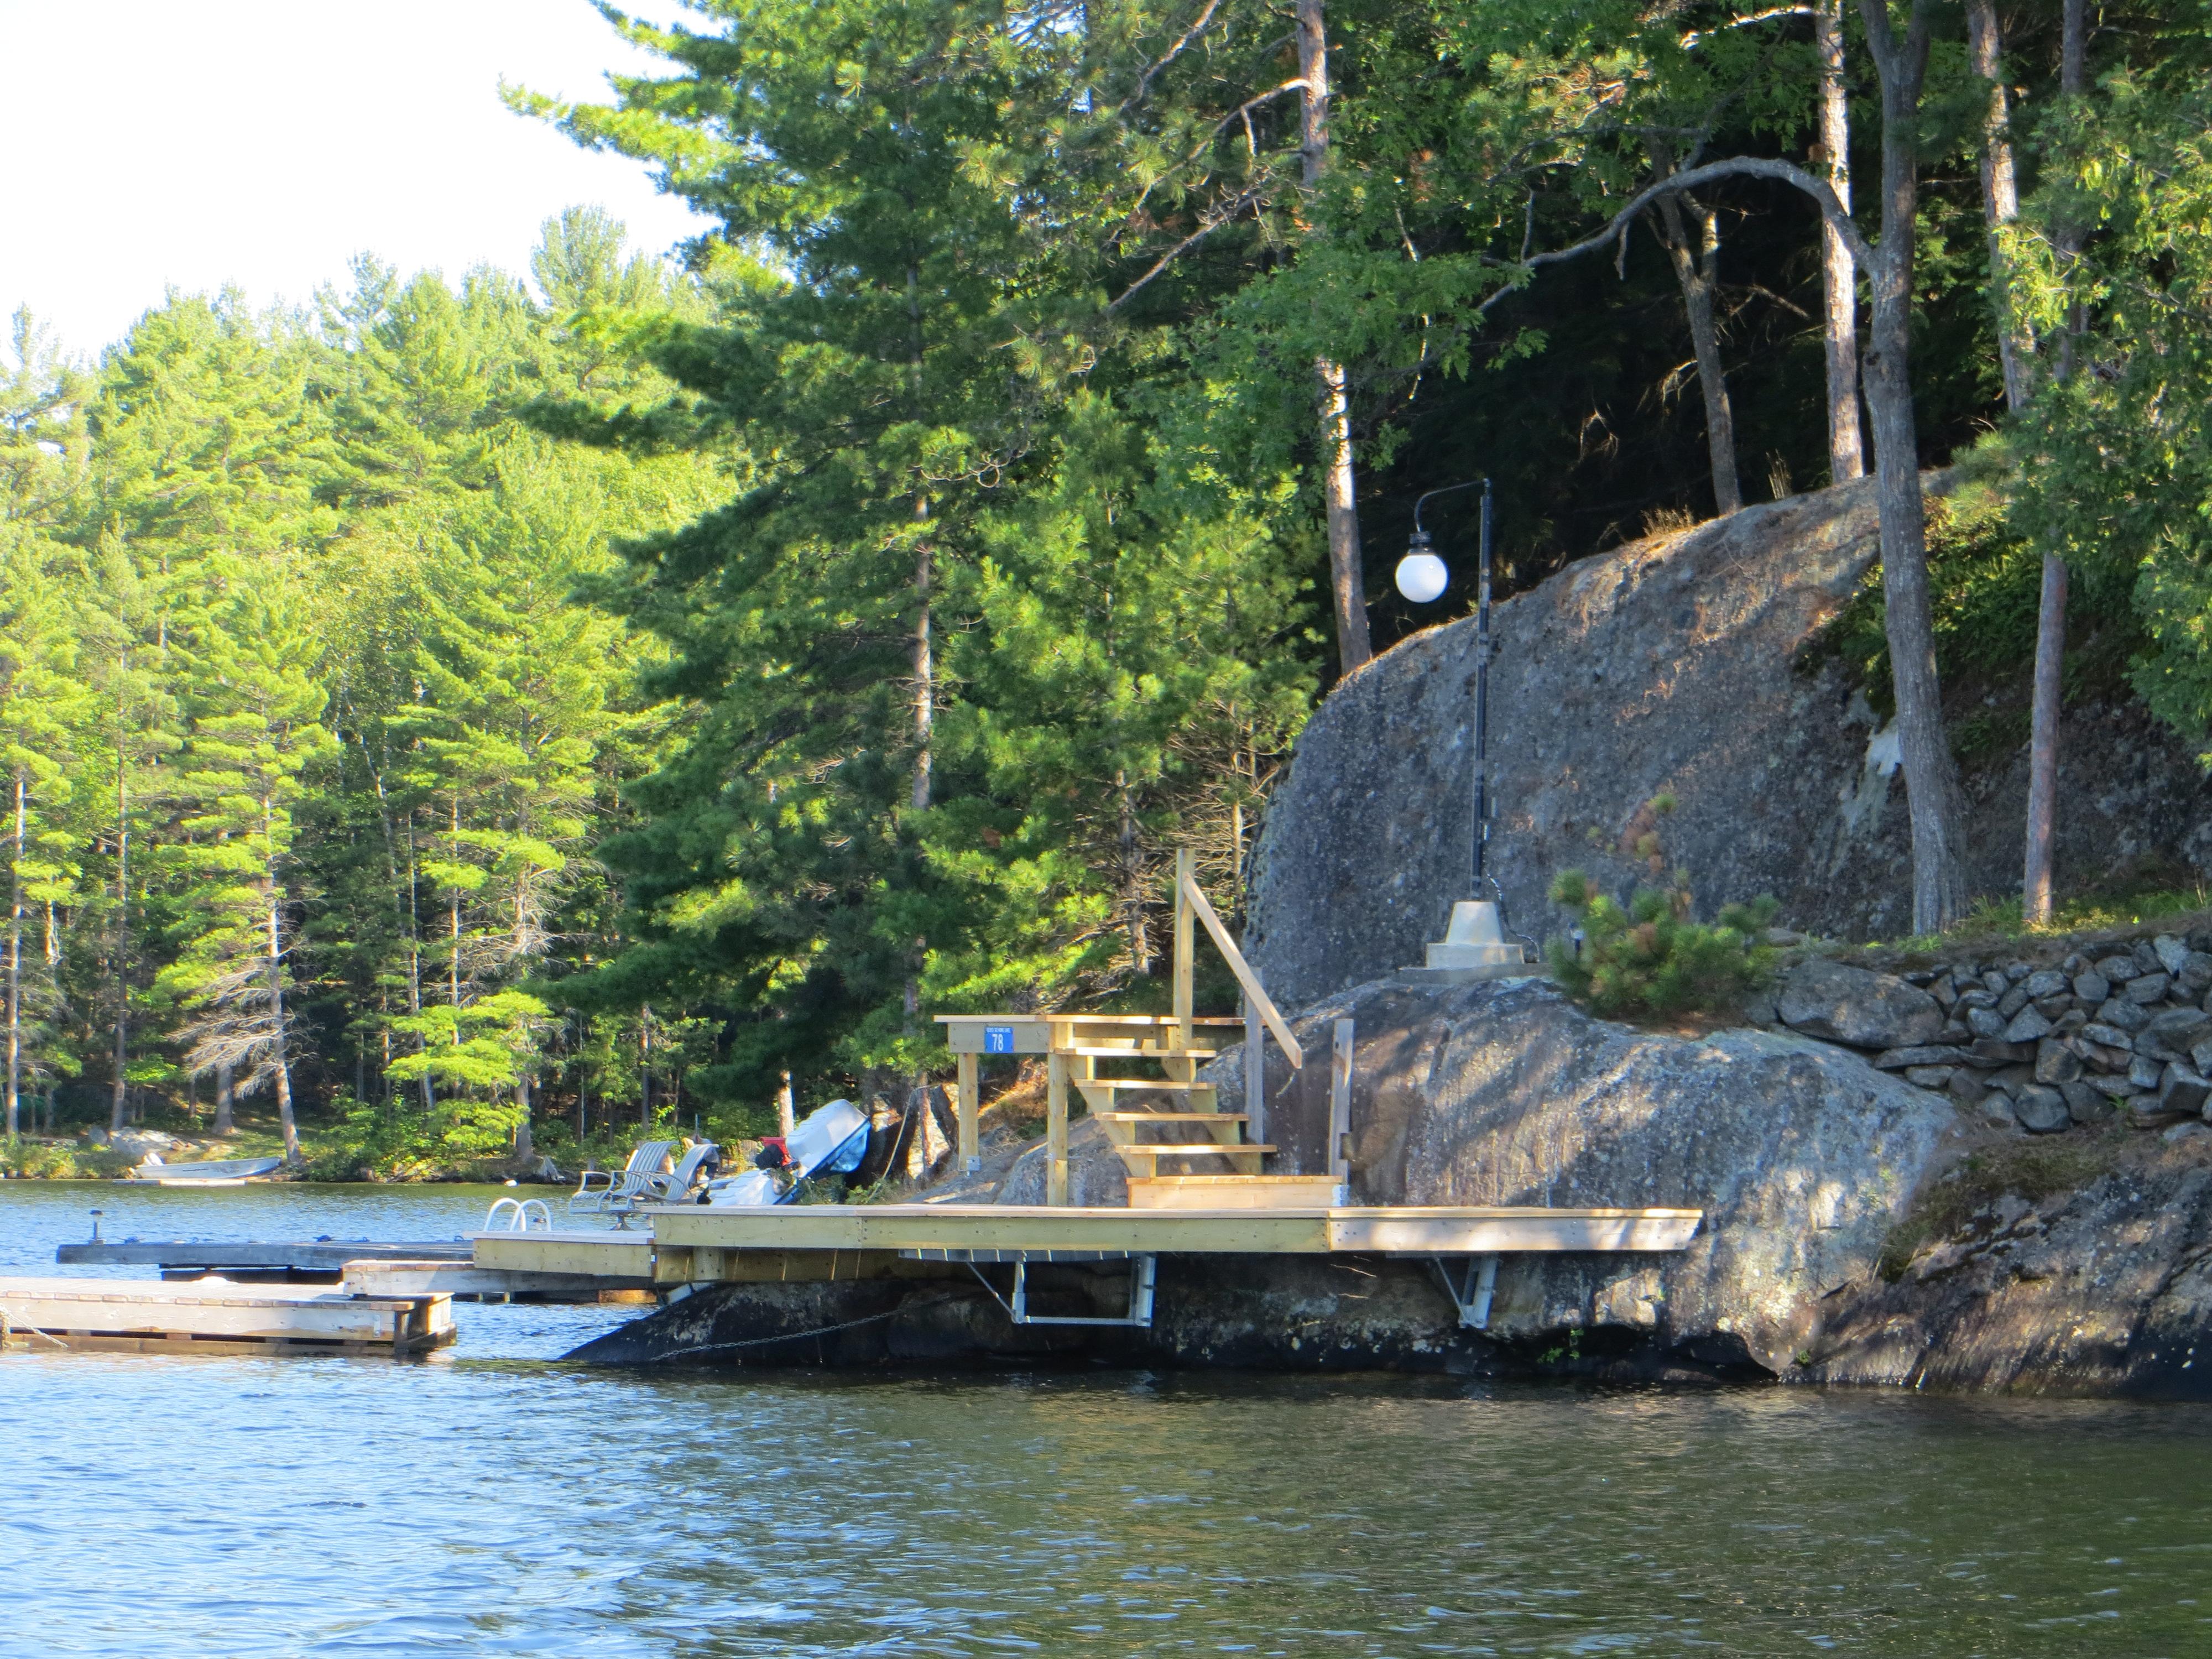 Completed DIY Cantilevered Dock